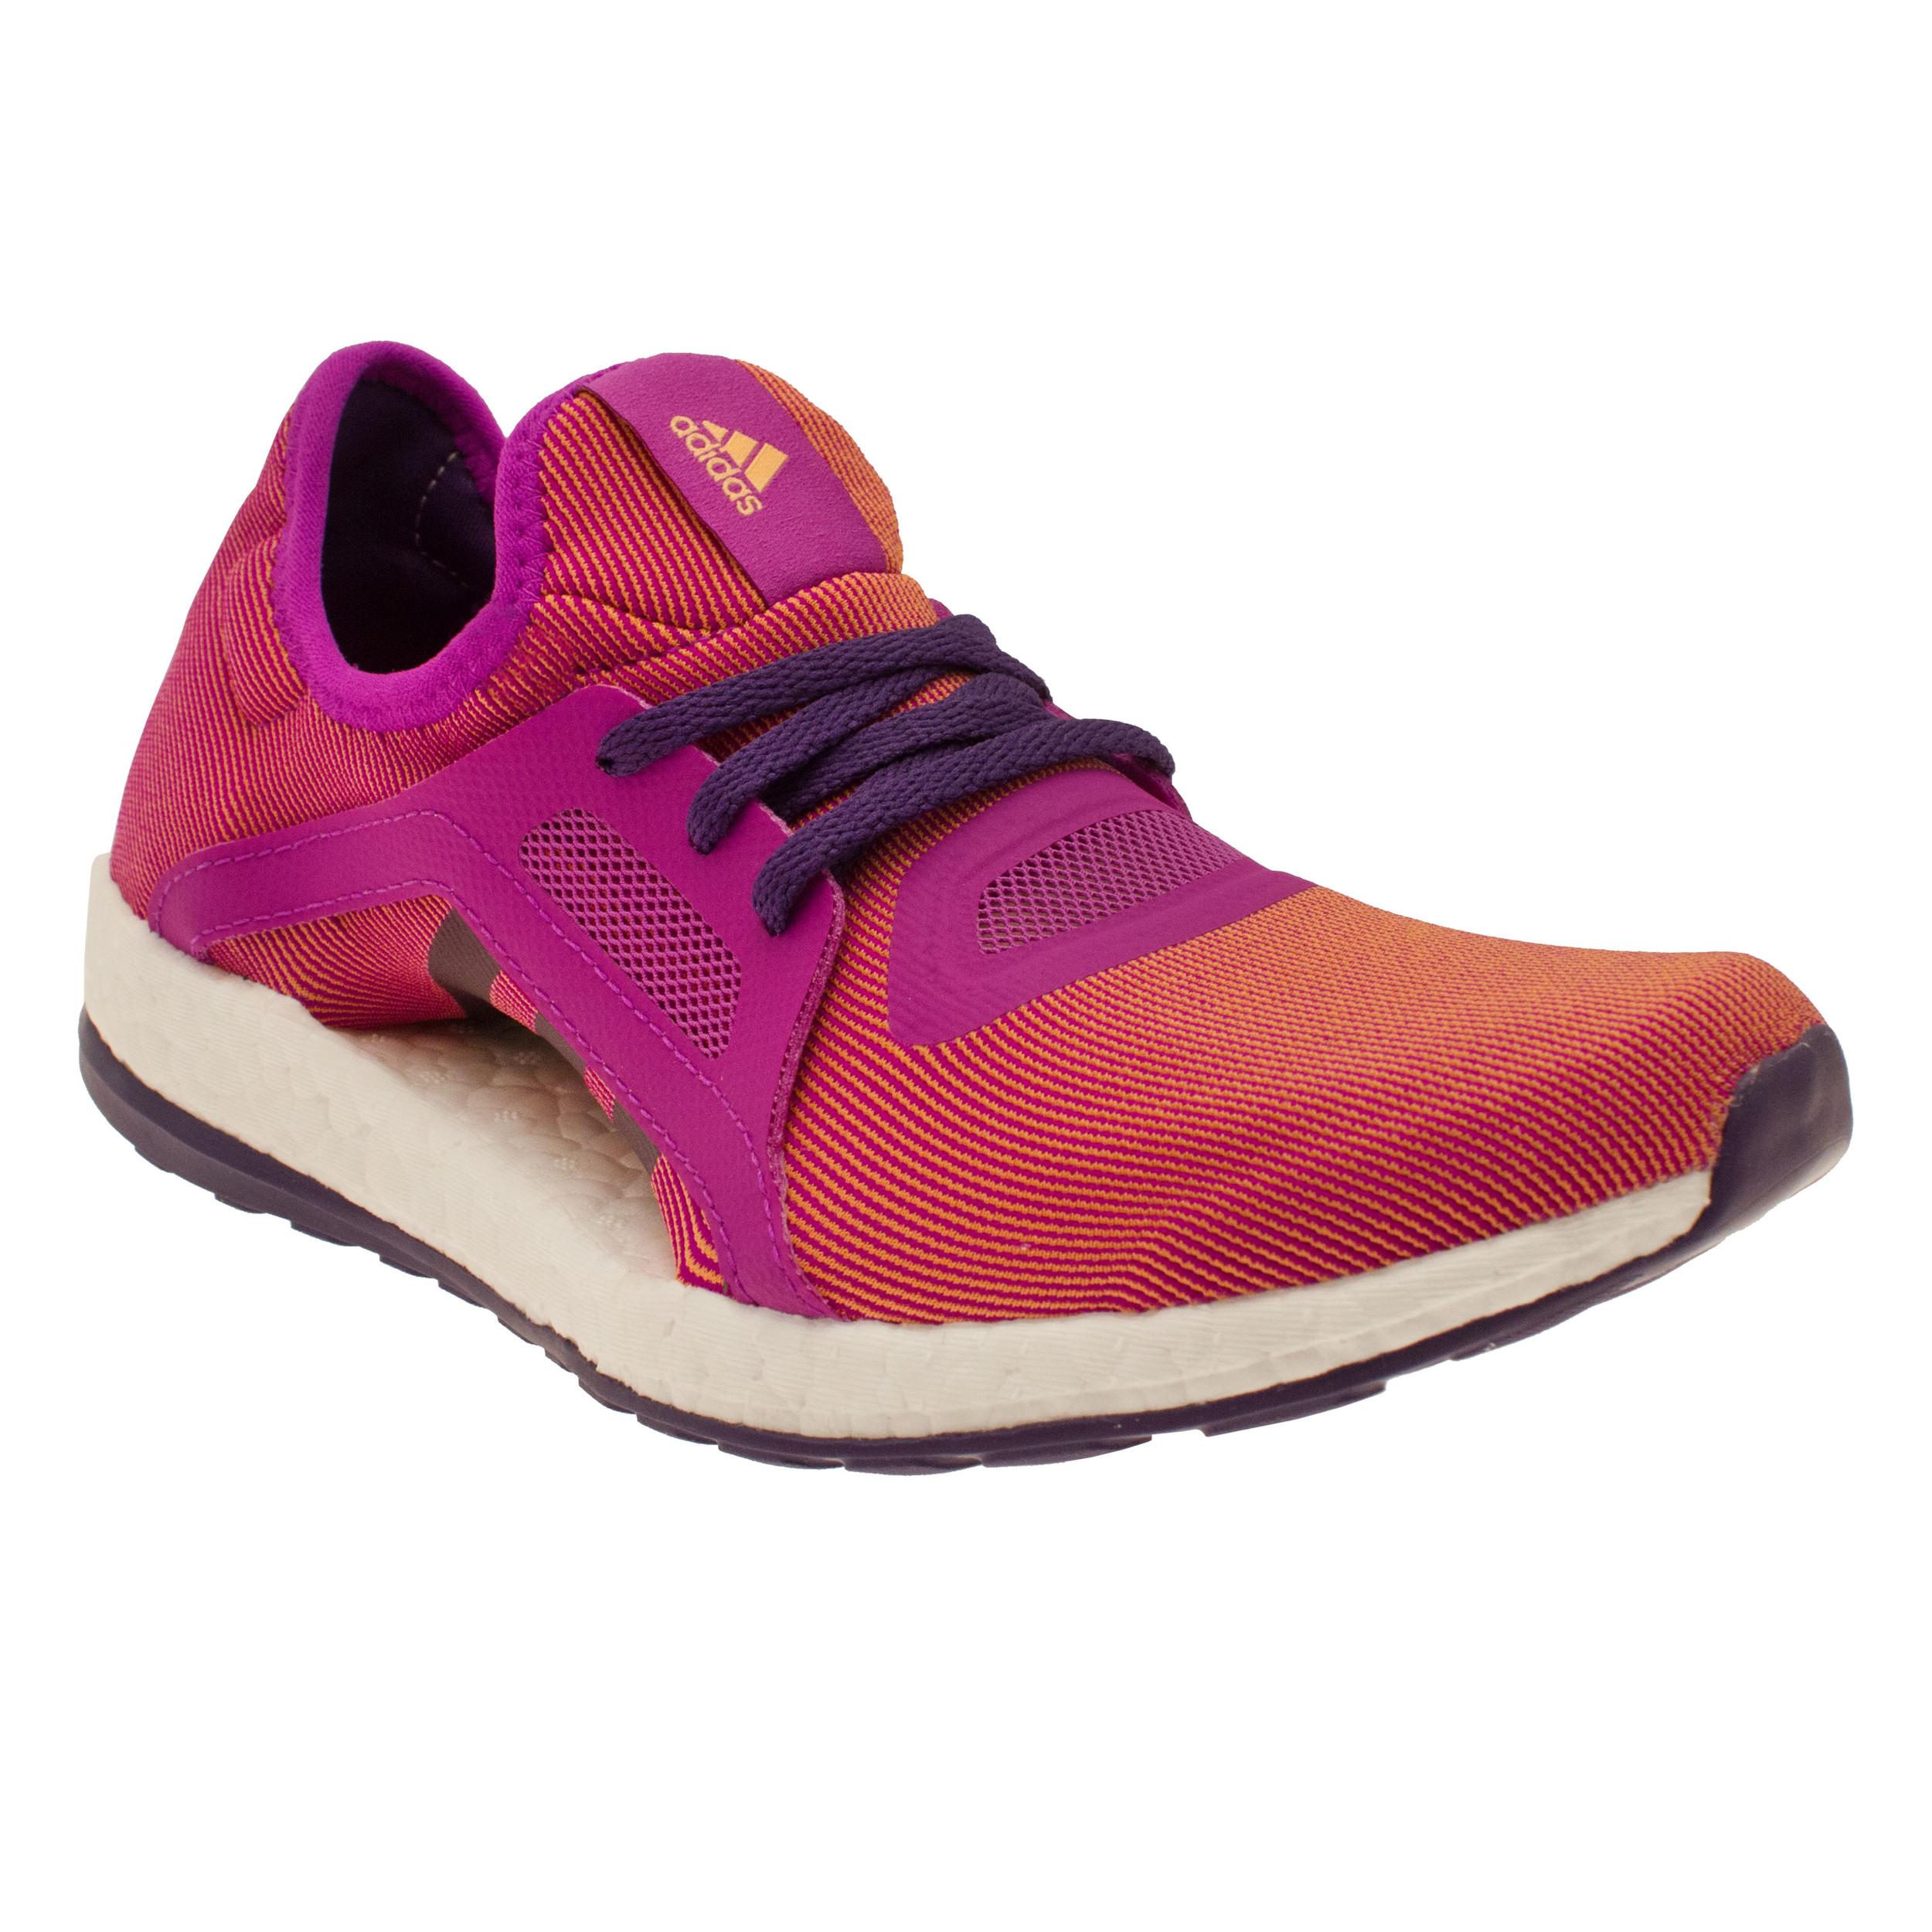 adidas pureboost x womens orange purple sneakers running